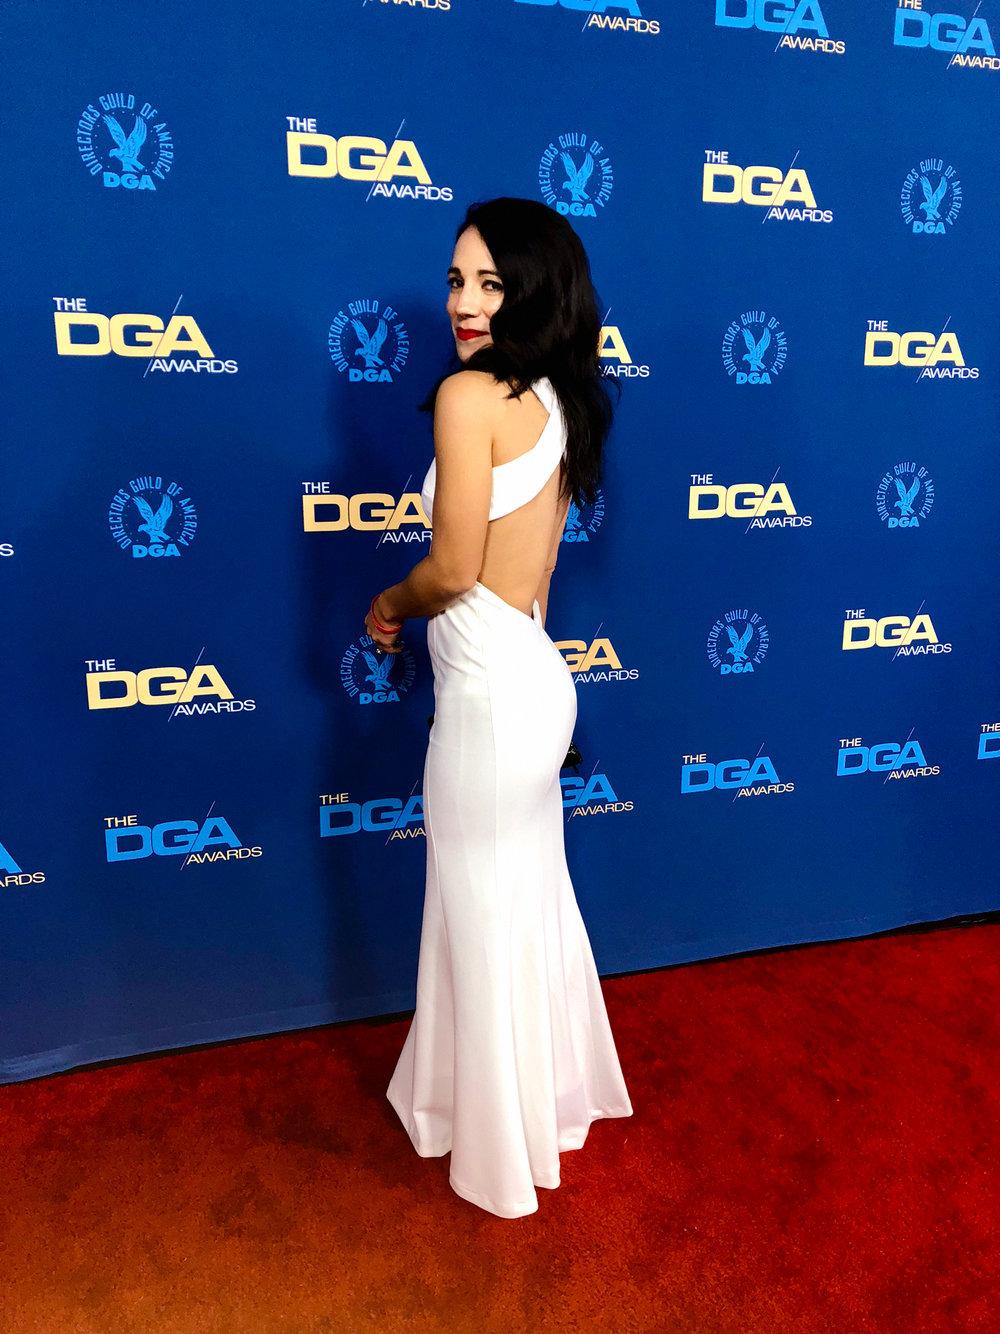 Lauren Indovina at the 71st Annual DGA Awards